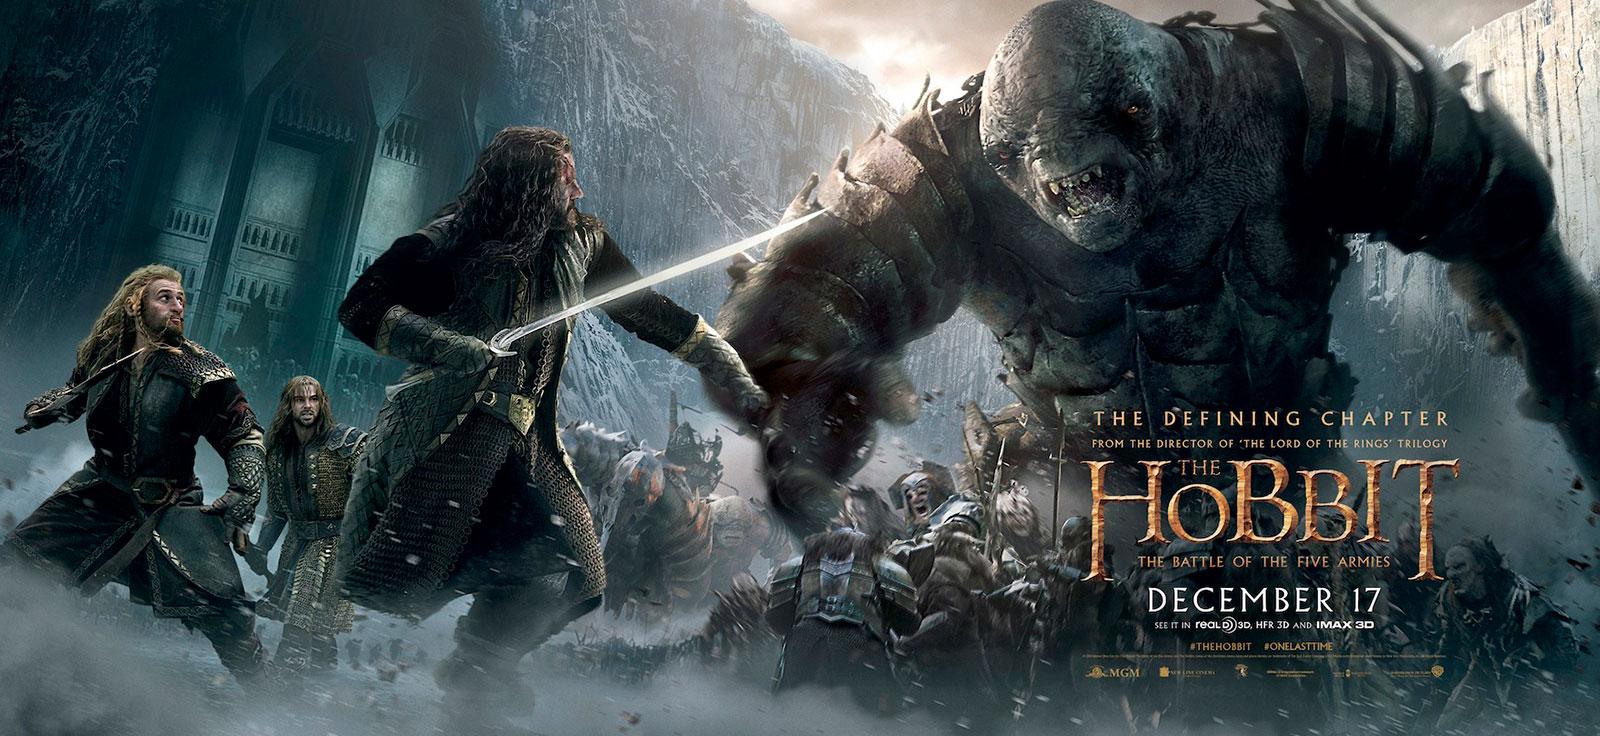 Hobbit 3 The Battle of the Five Armies 2014 Desktop Wallpaper HD 1600x736